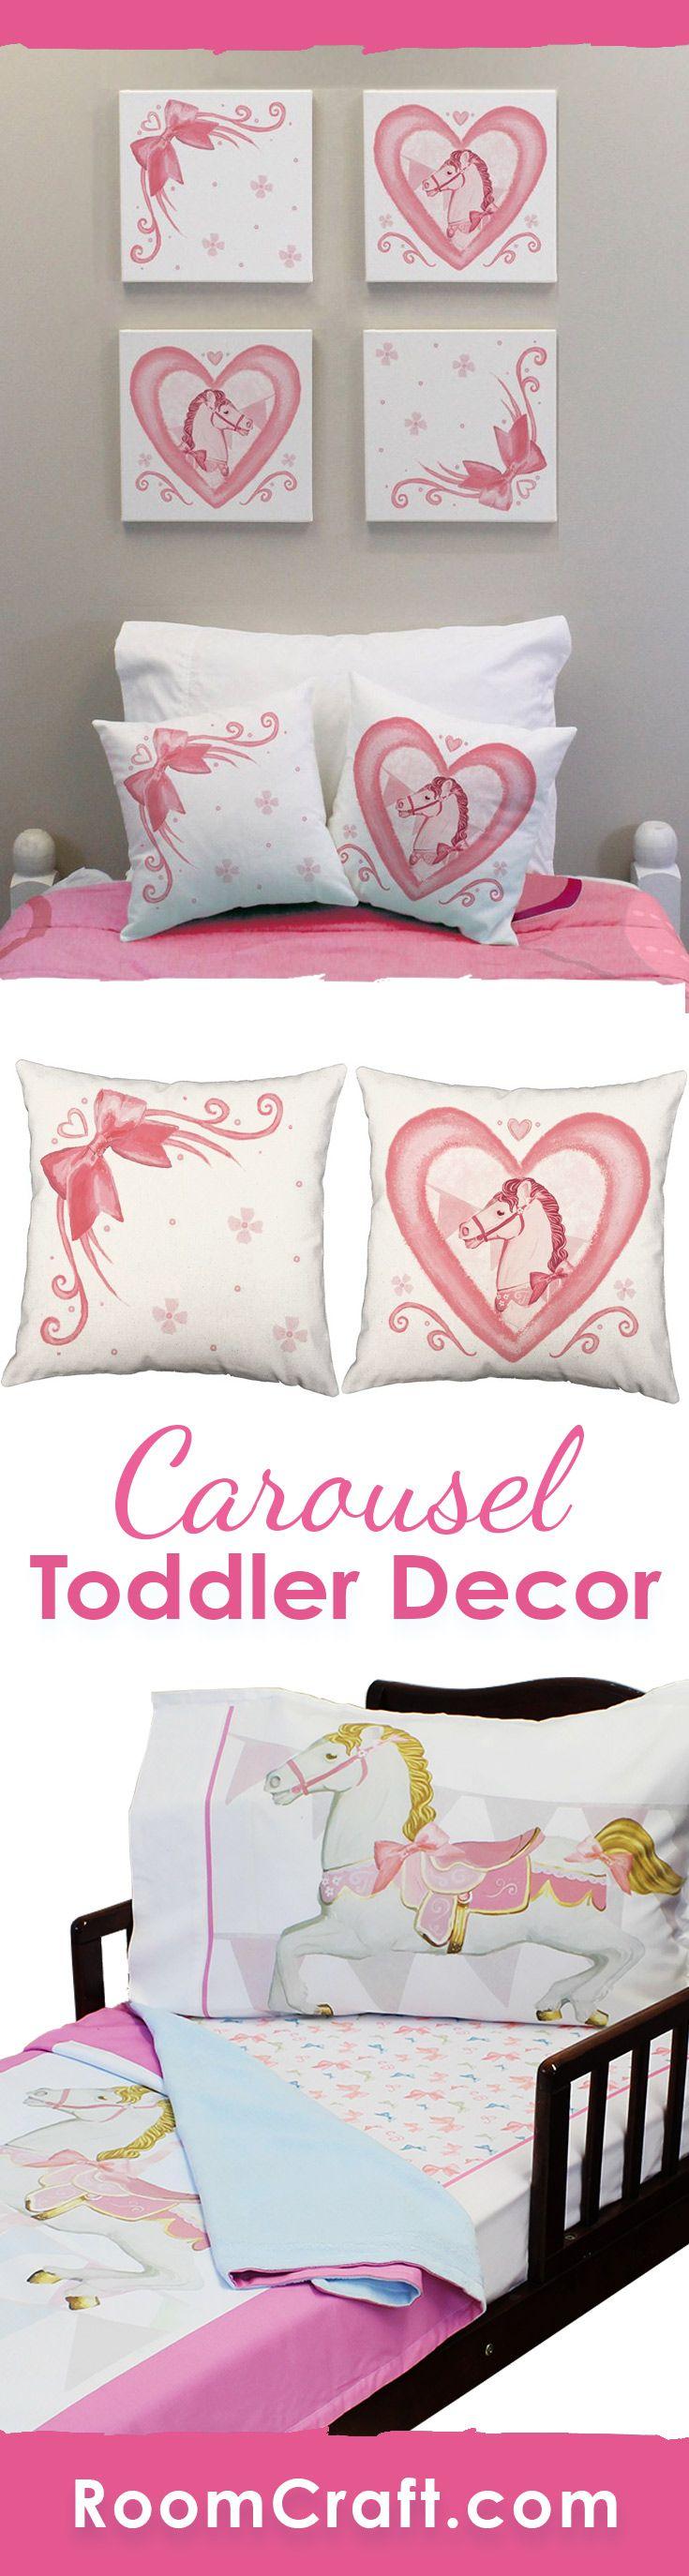 Horse shaped pillows for children - Darling Carousel Toddler Bedding Set